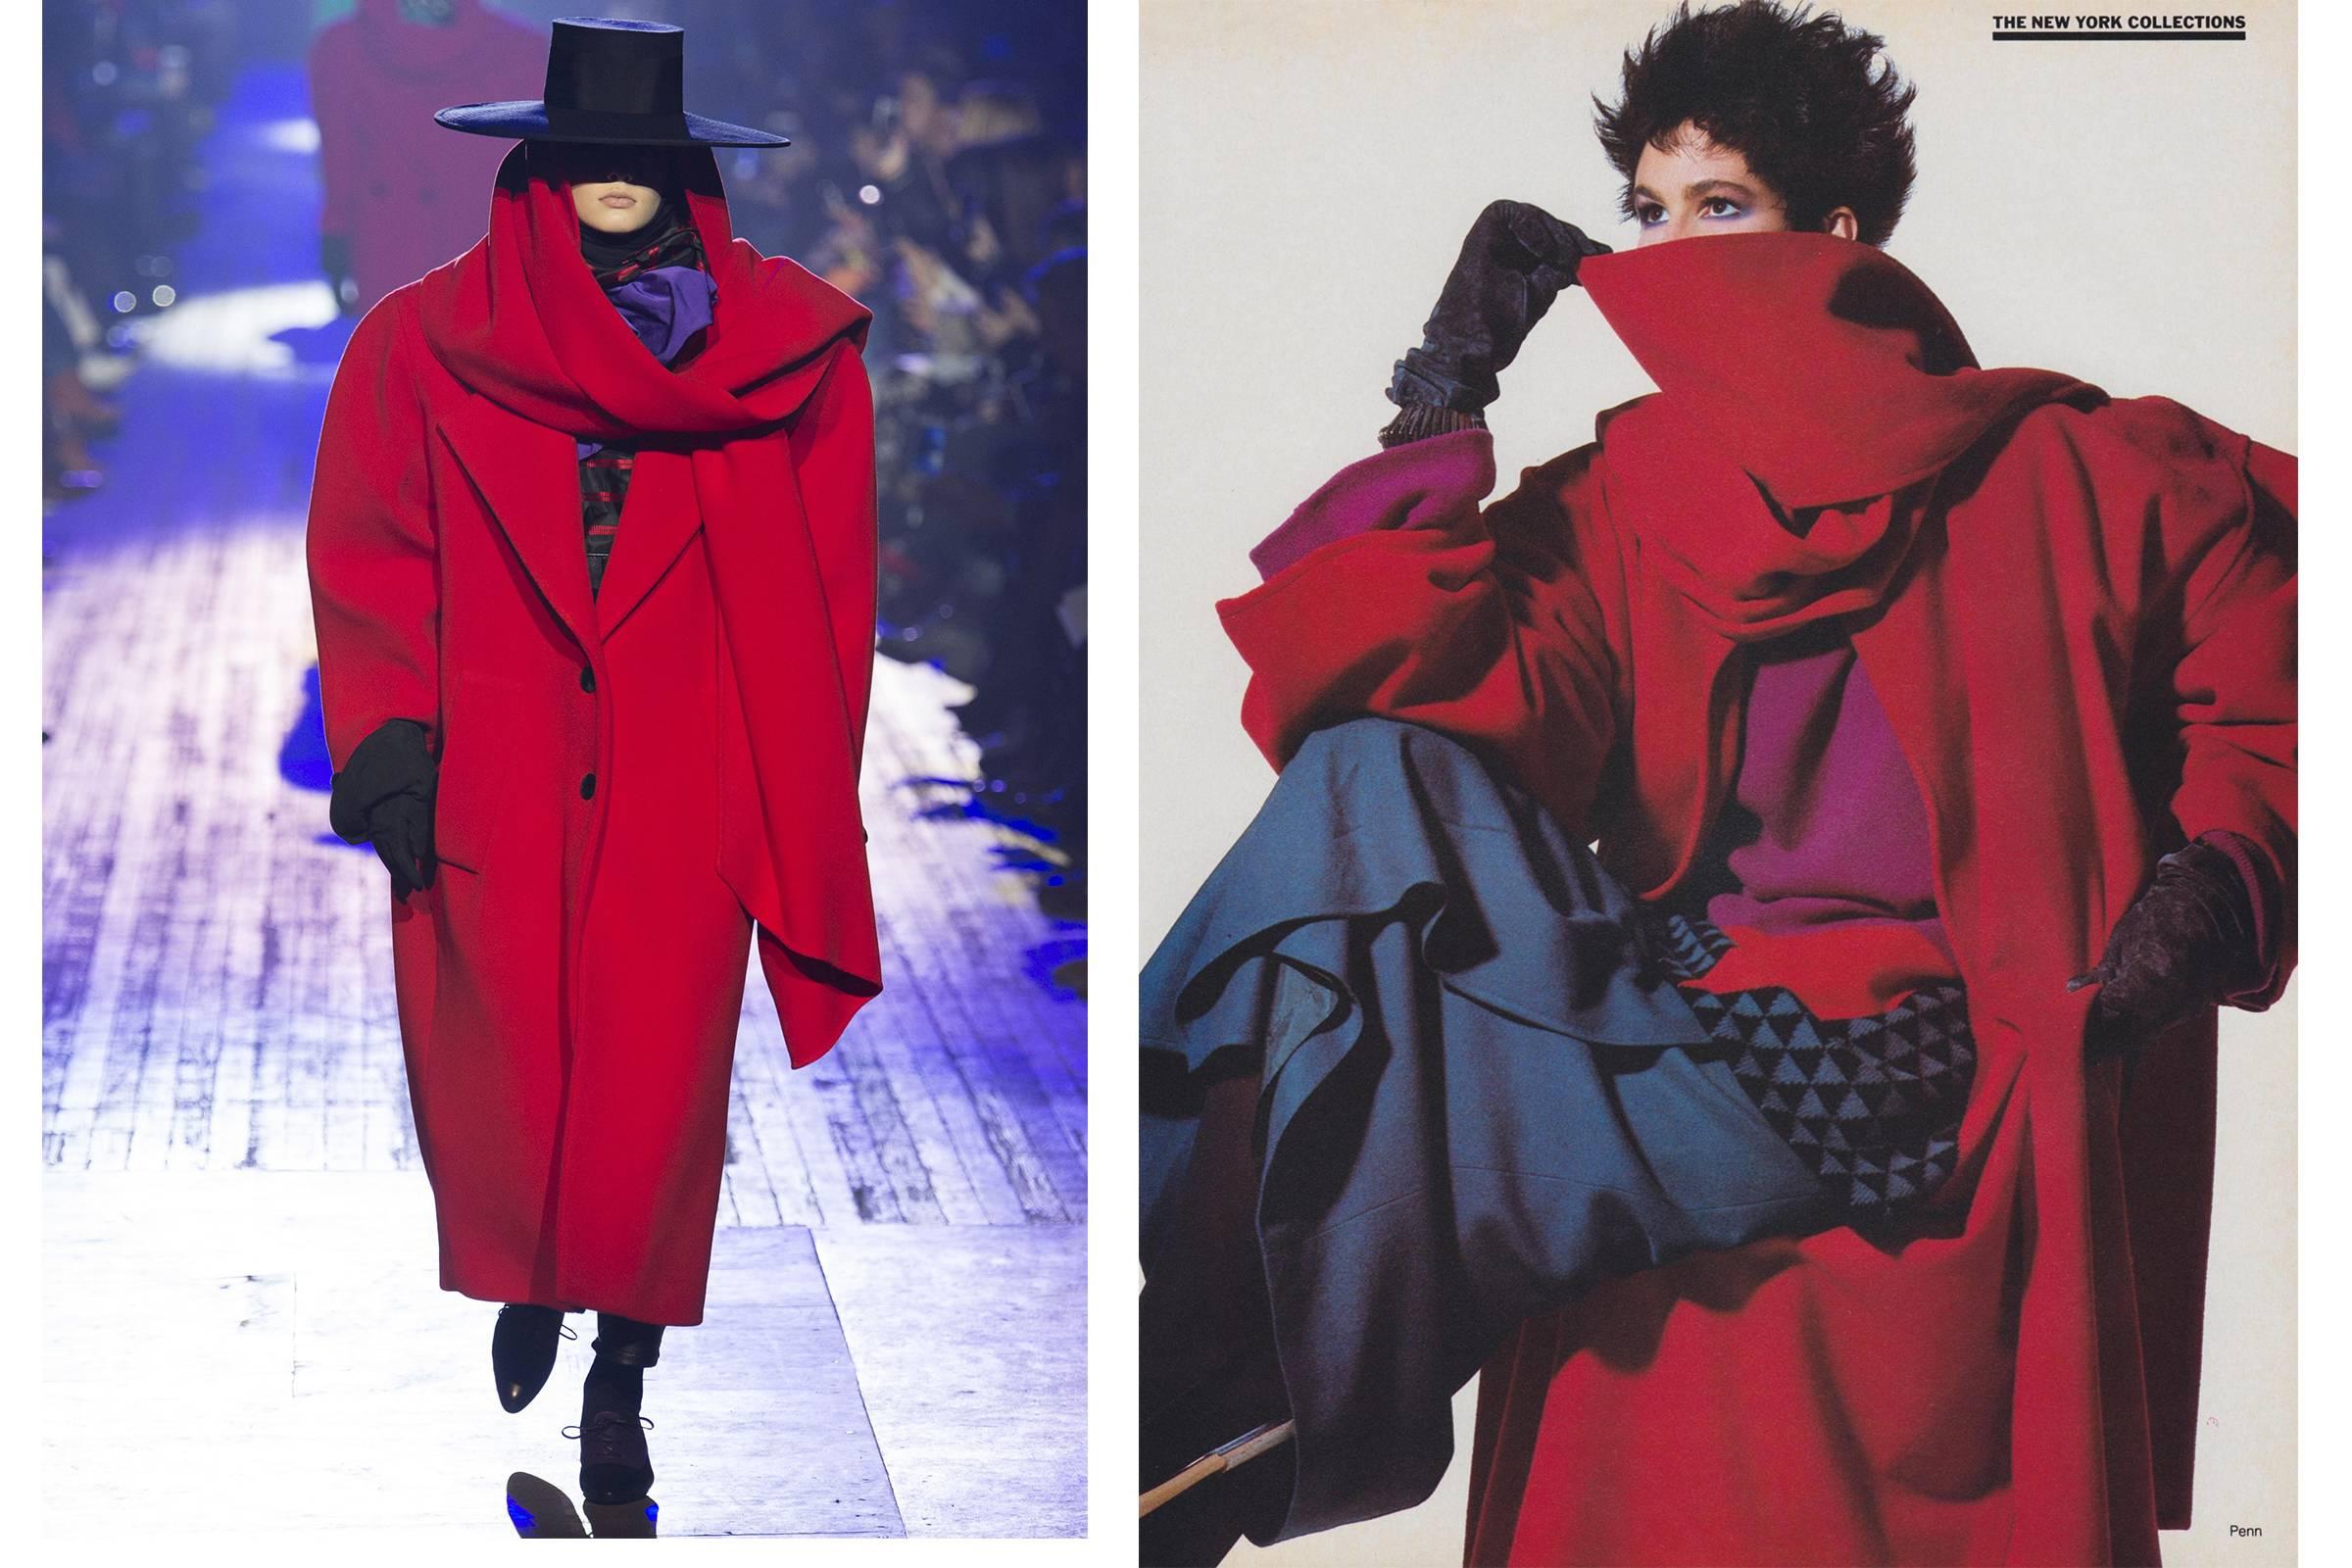 Heroine: Reviving the 80s Through Contemporary Fashion